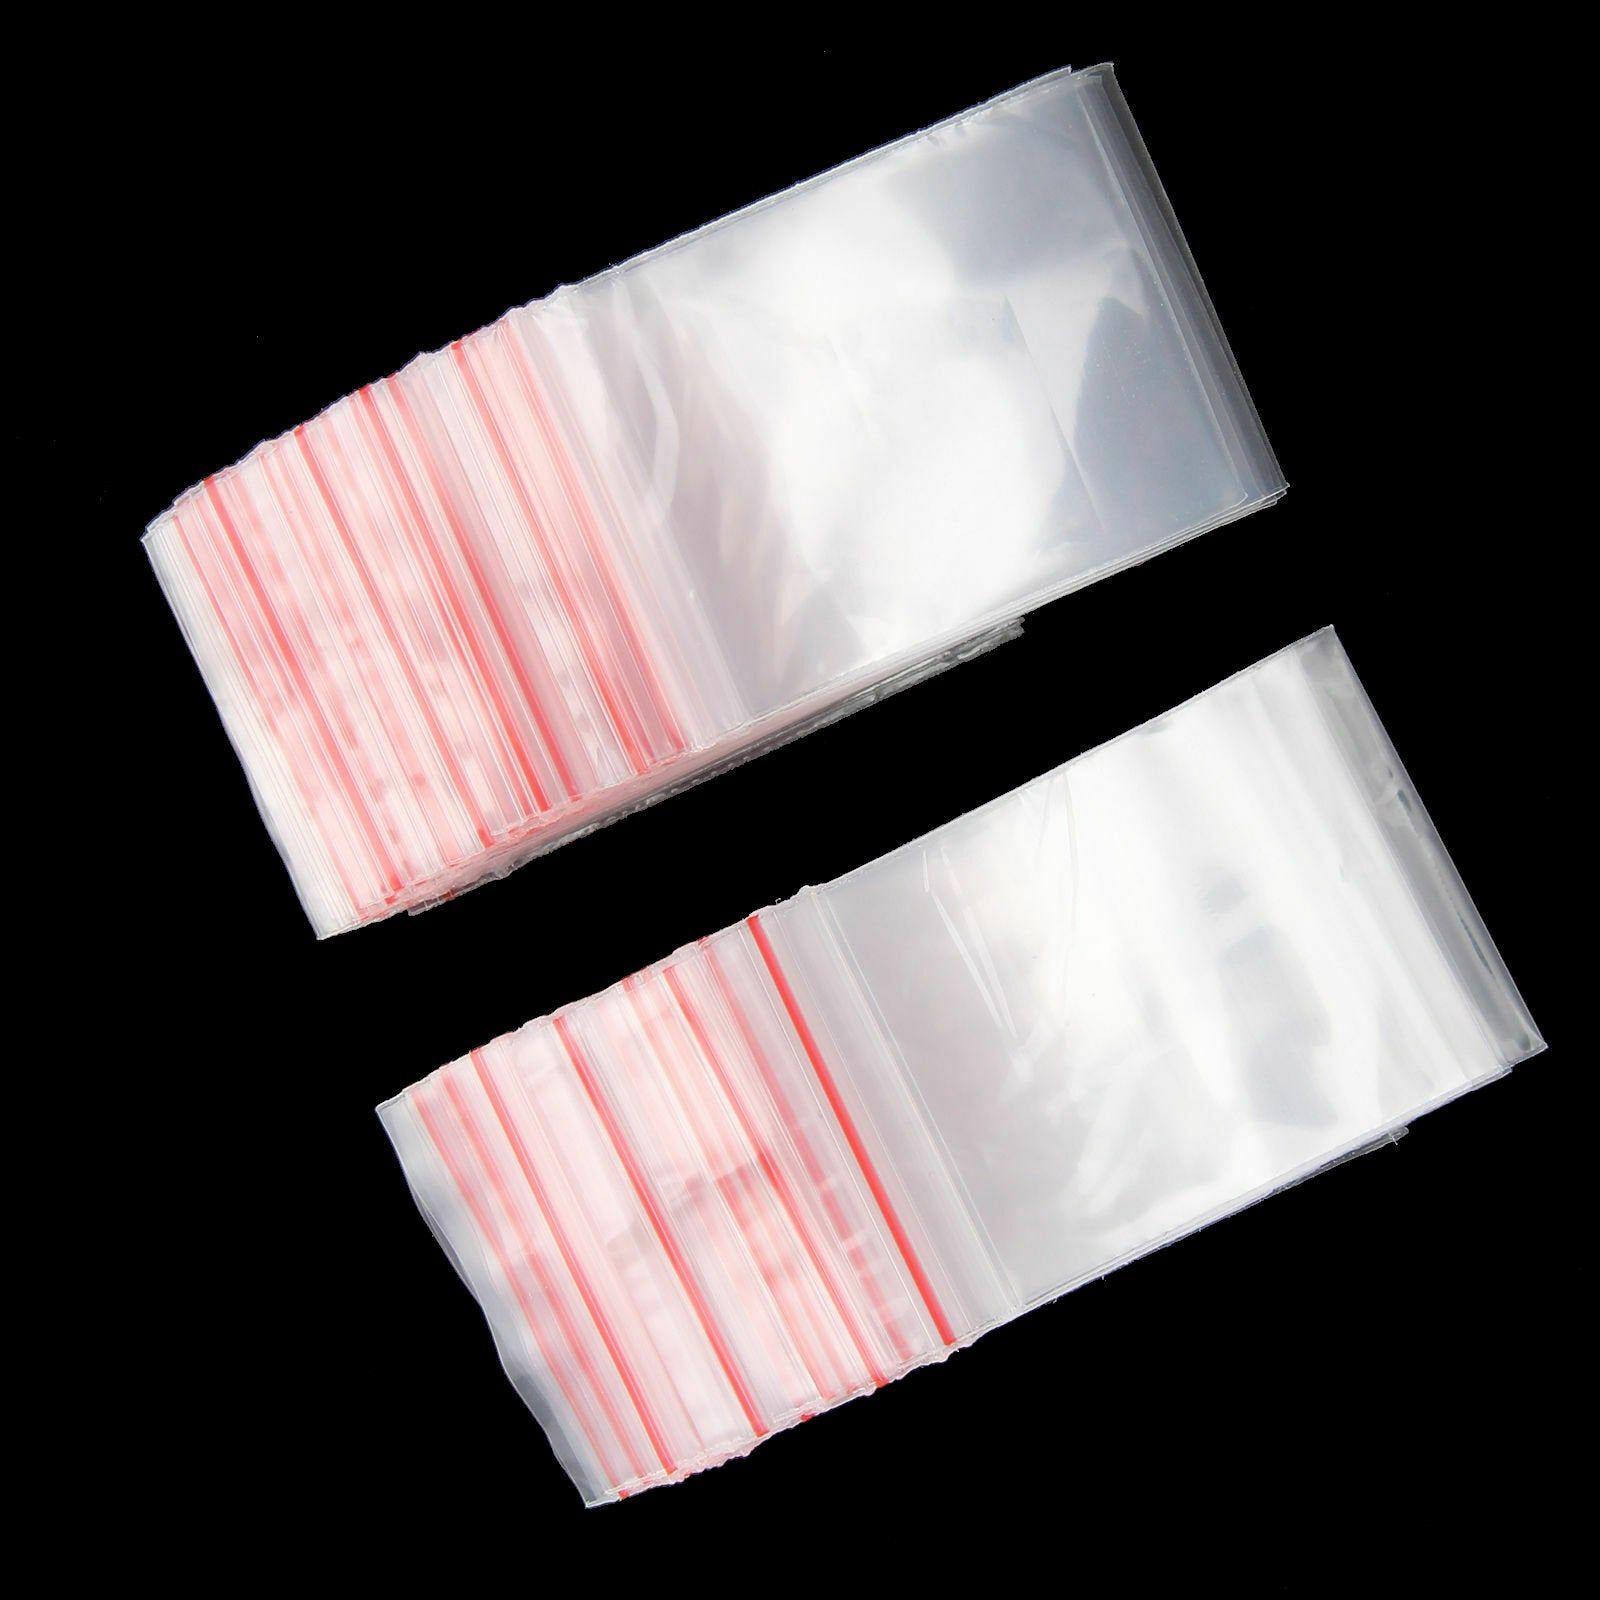 100 small clear self adhesive zip lock plastic bags 6x4 cm